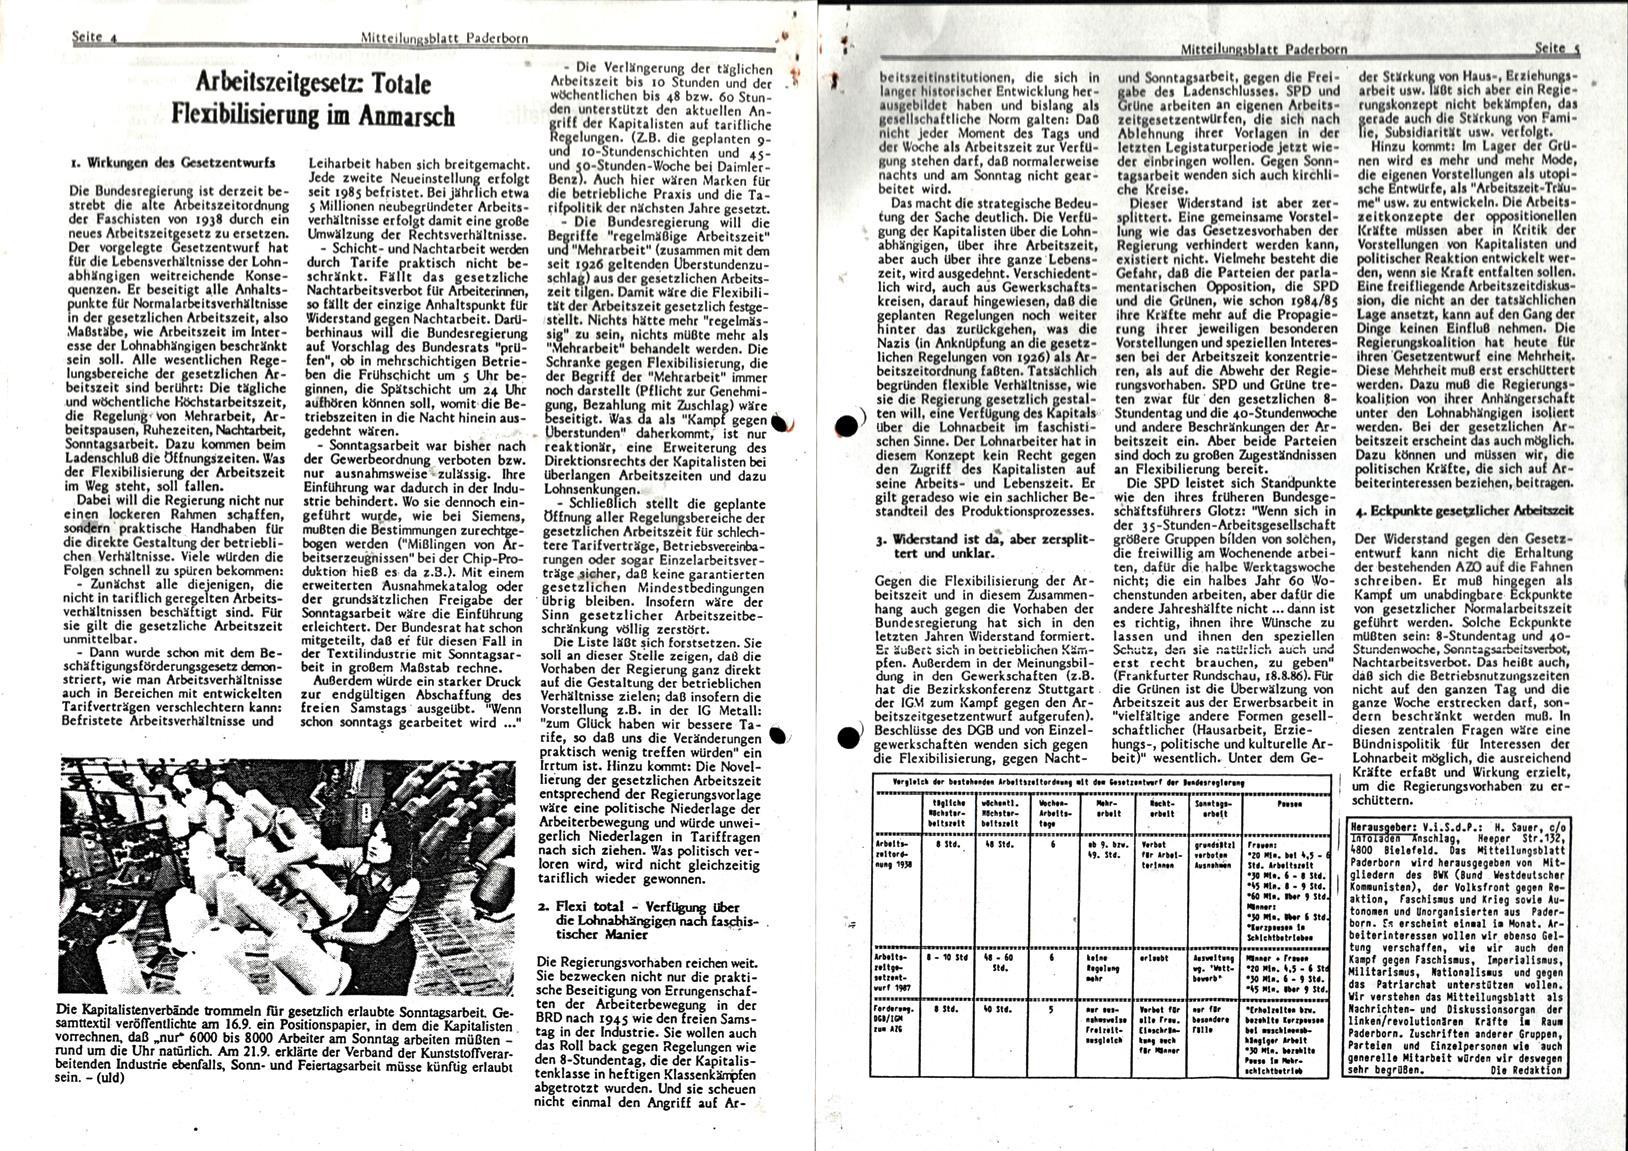 Paderborn_BWK_Mitteilungsblatt_19871116_003